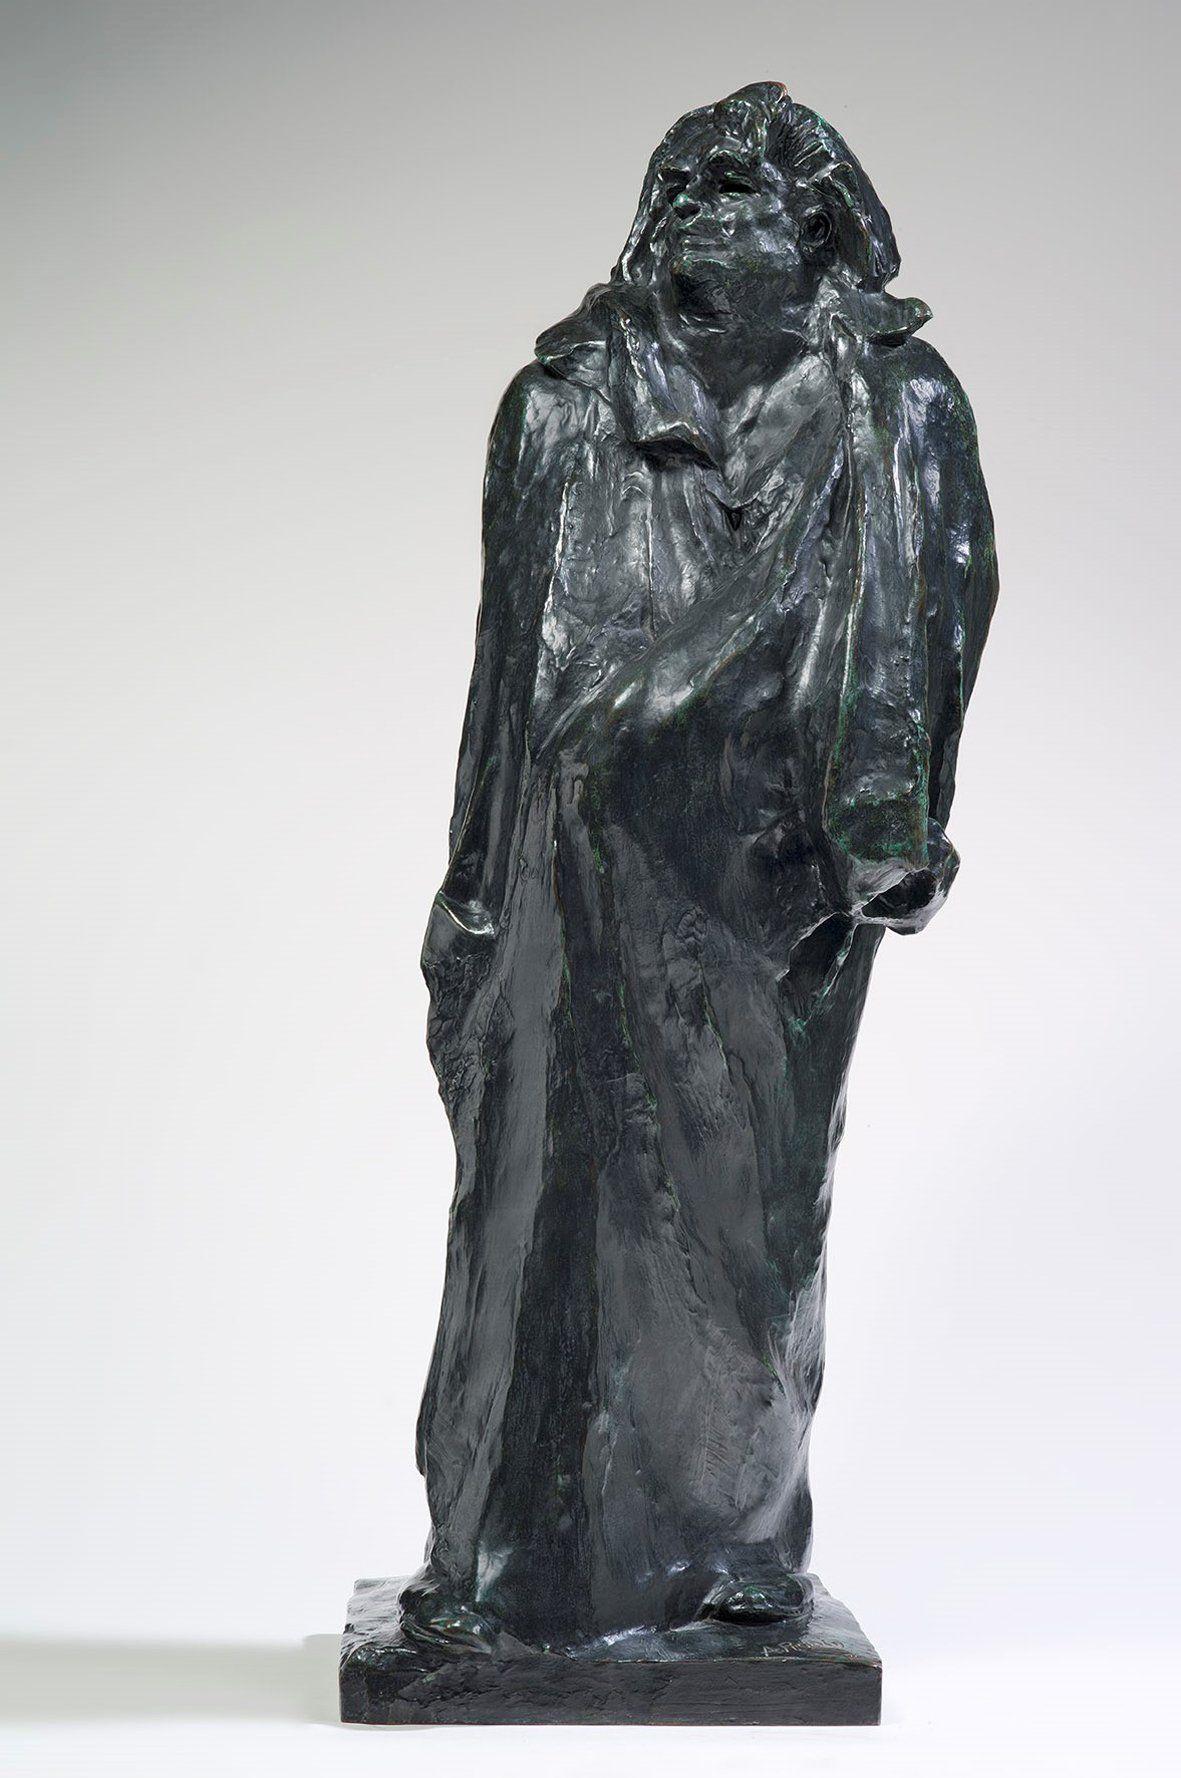 Auguste Rodin, Balzac, studio finale, 1897 bronzo, cm 108,5 x 43 x 38 Parigi, Musée Rodin. - © musee Rodin, foto Christian Baraja